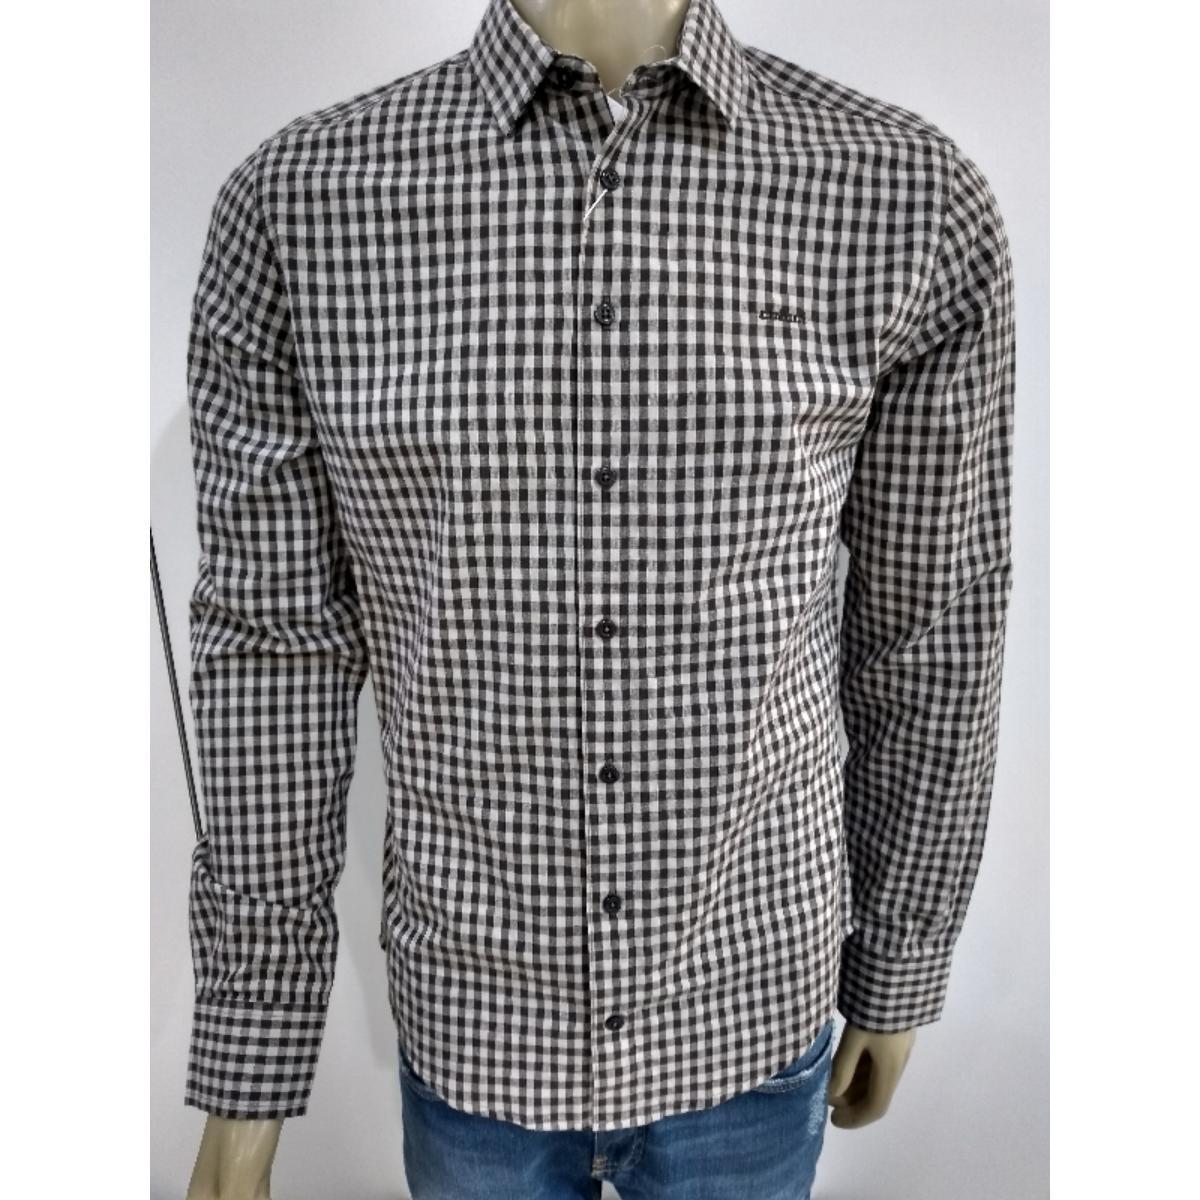 Camisa Masculina Colcci 310103051 Vc10 Xadrez